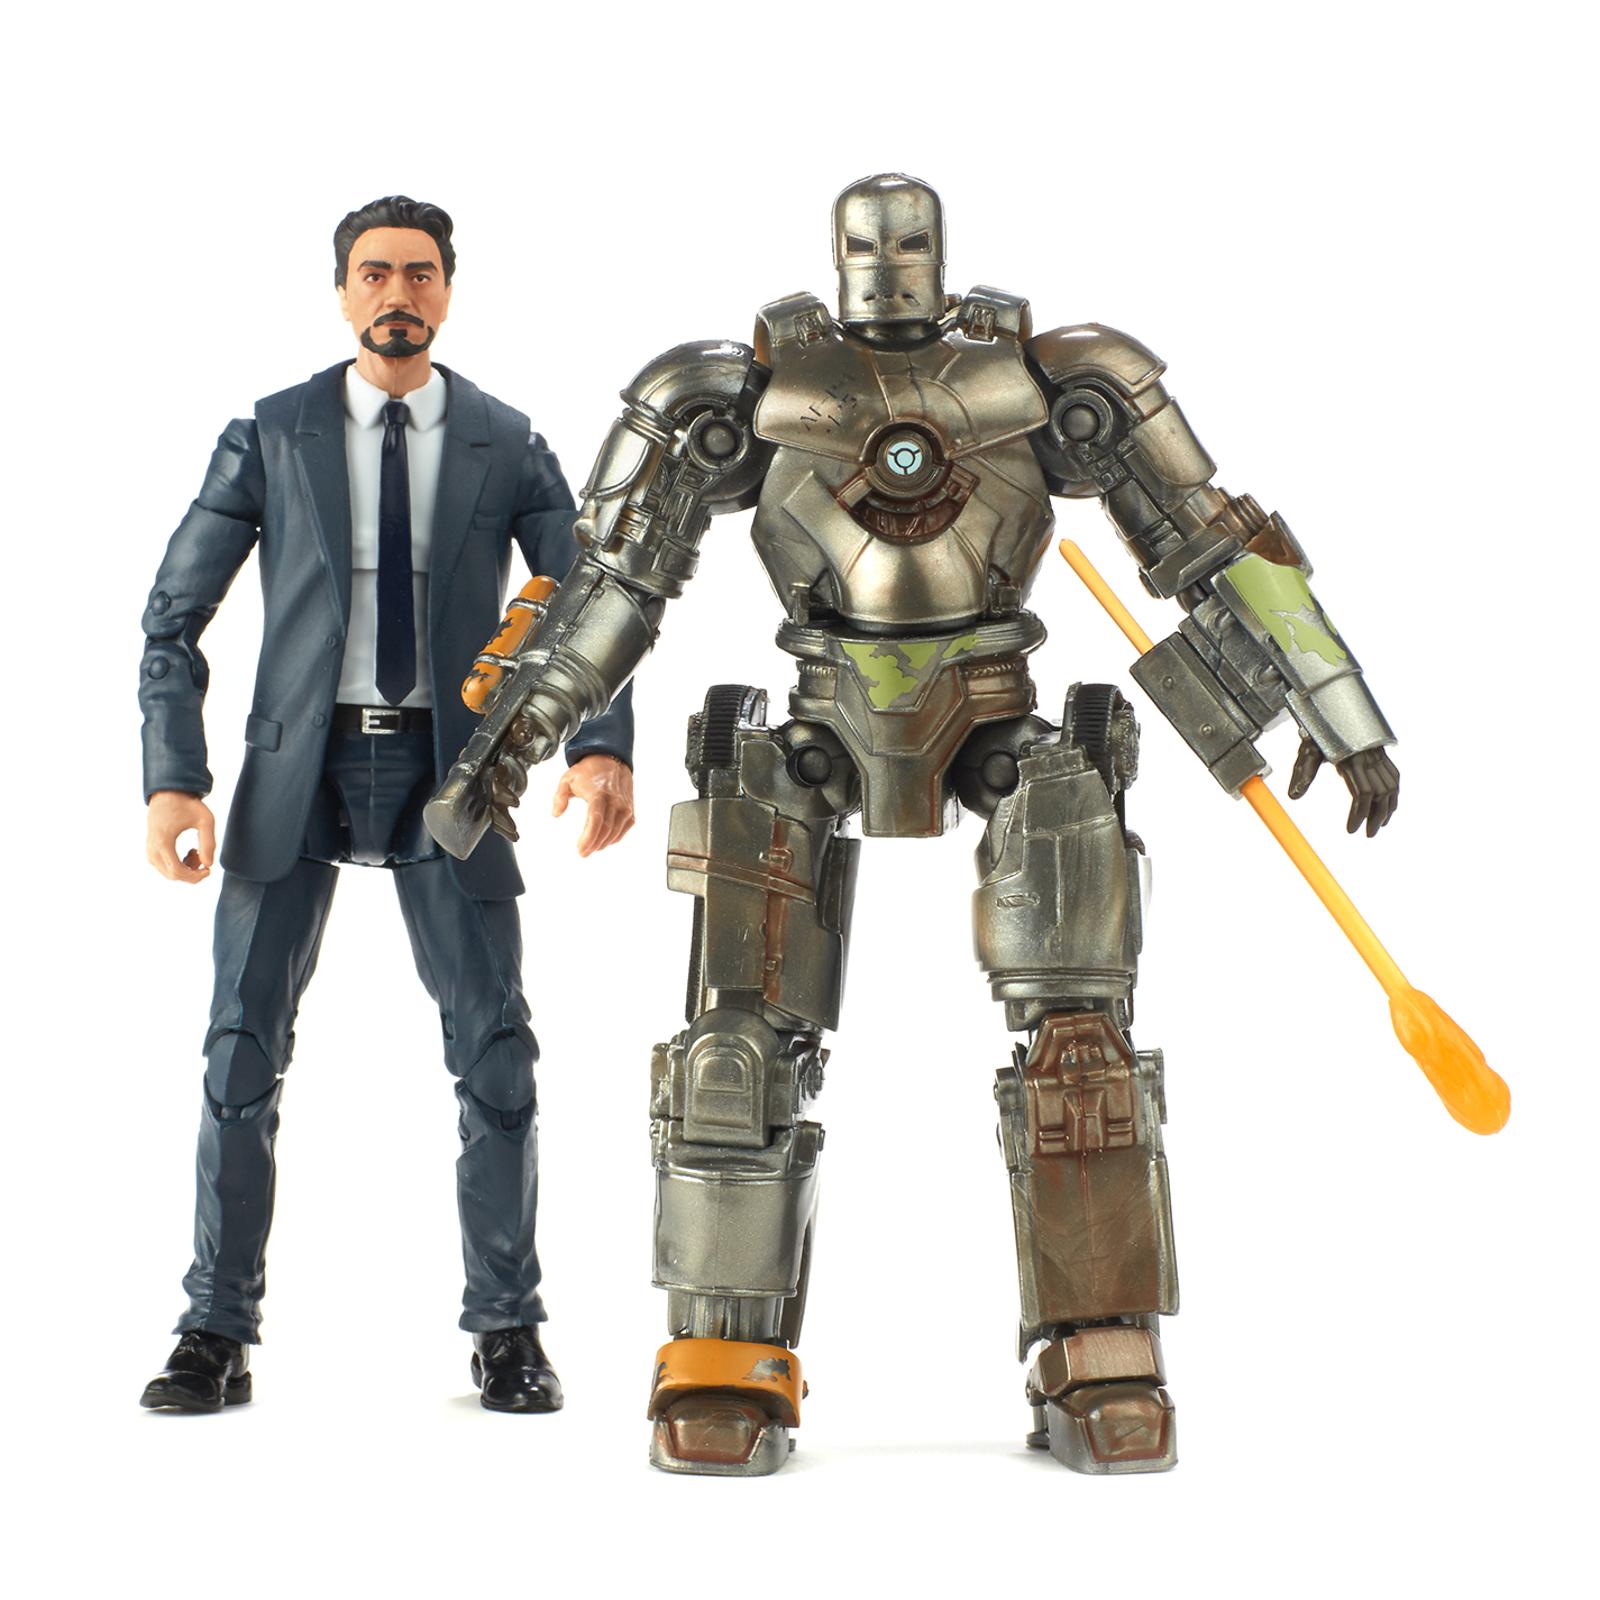 Iron Man: Tony Stark and Iron Man MK I Two-Pack.